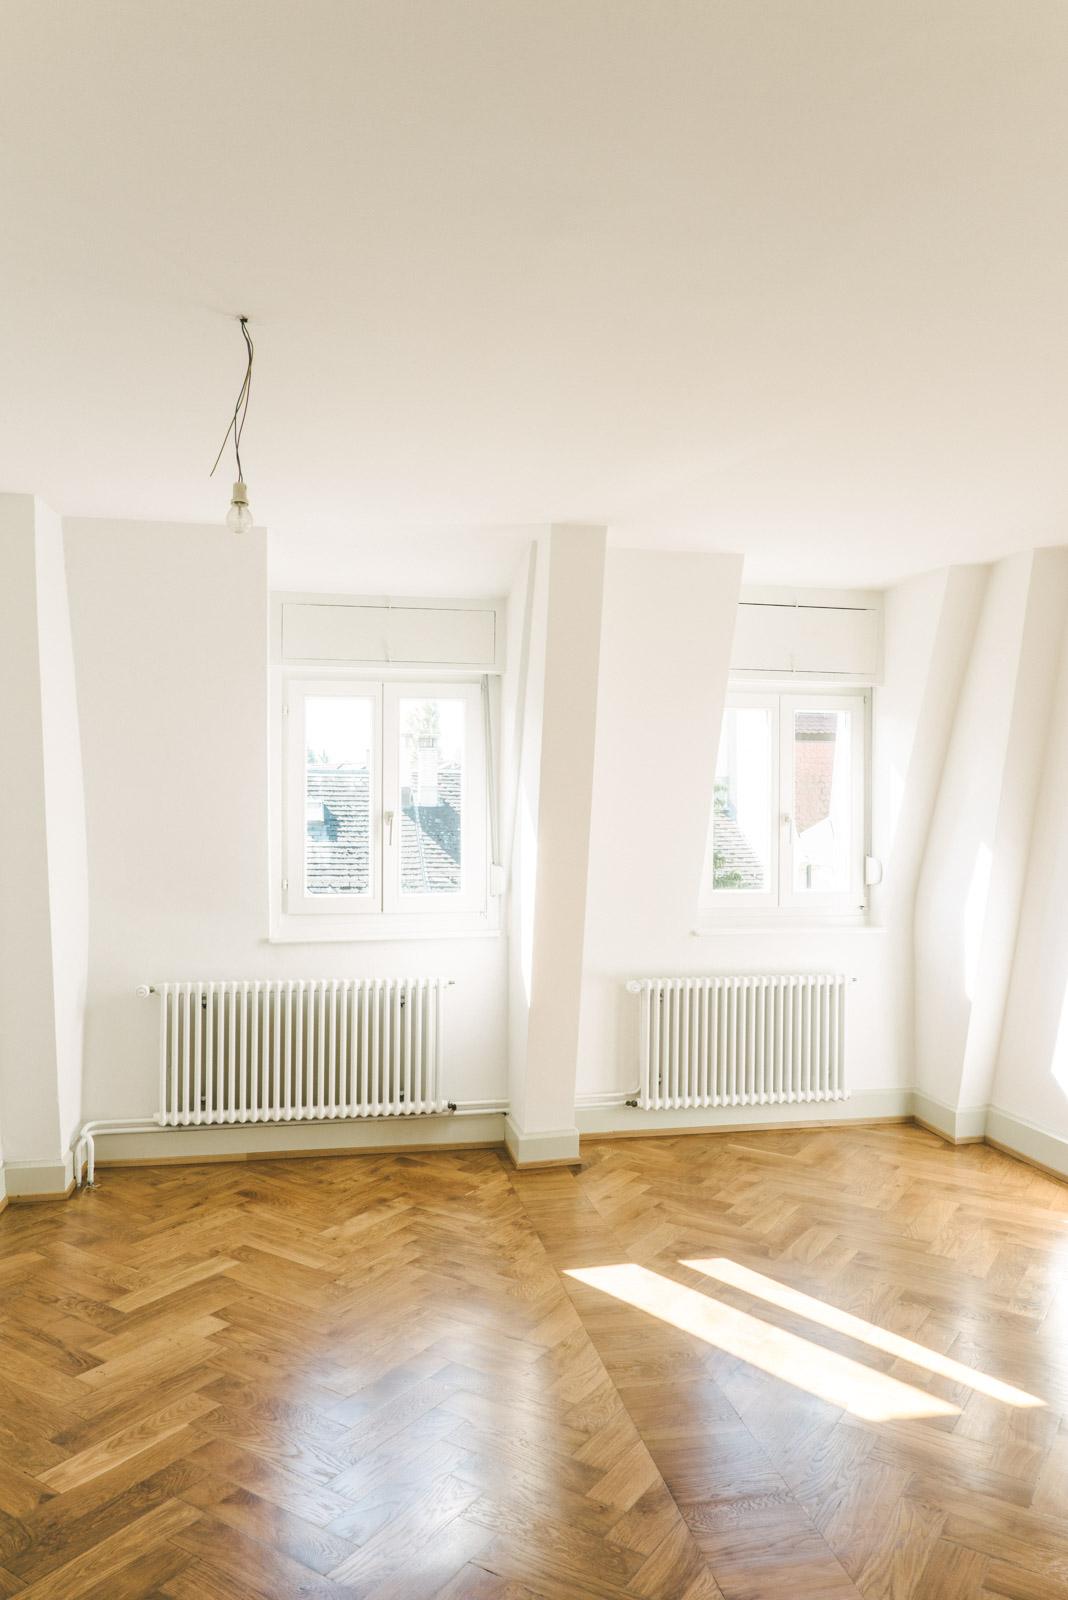 Umbau MFH Basel Fensterfront, Consilium Architektur und Baumanagement